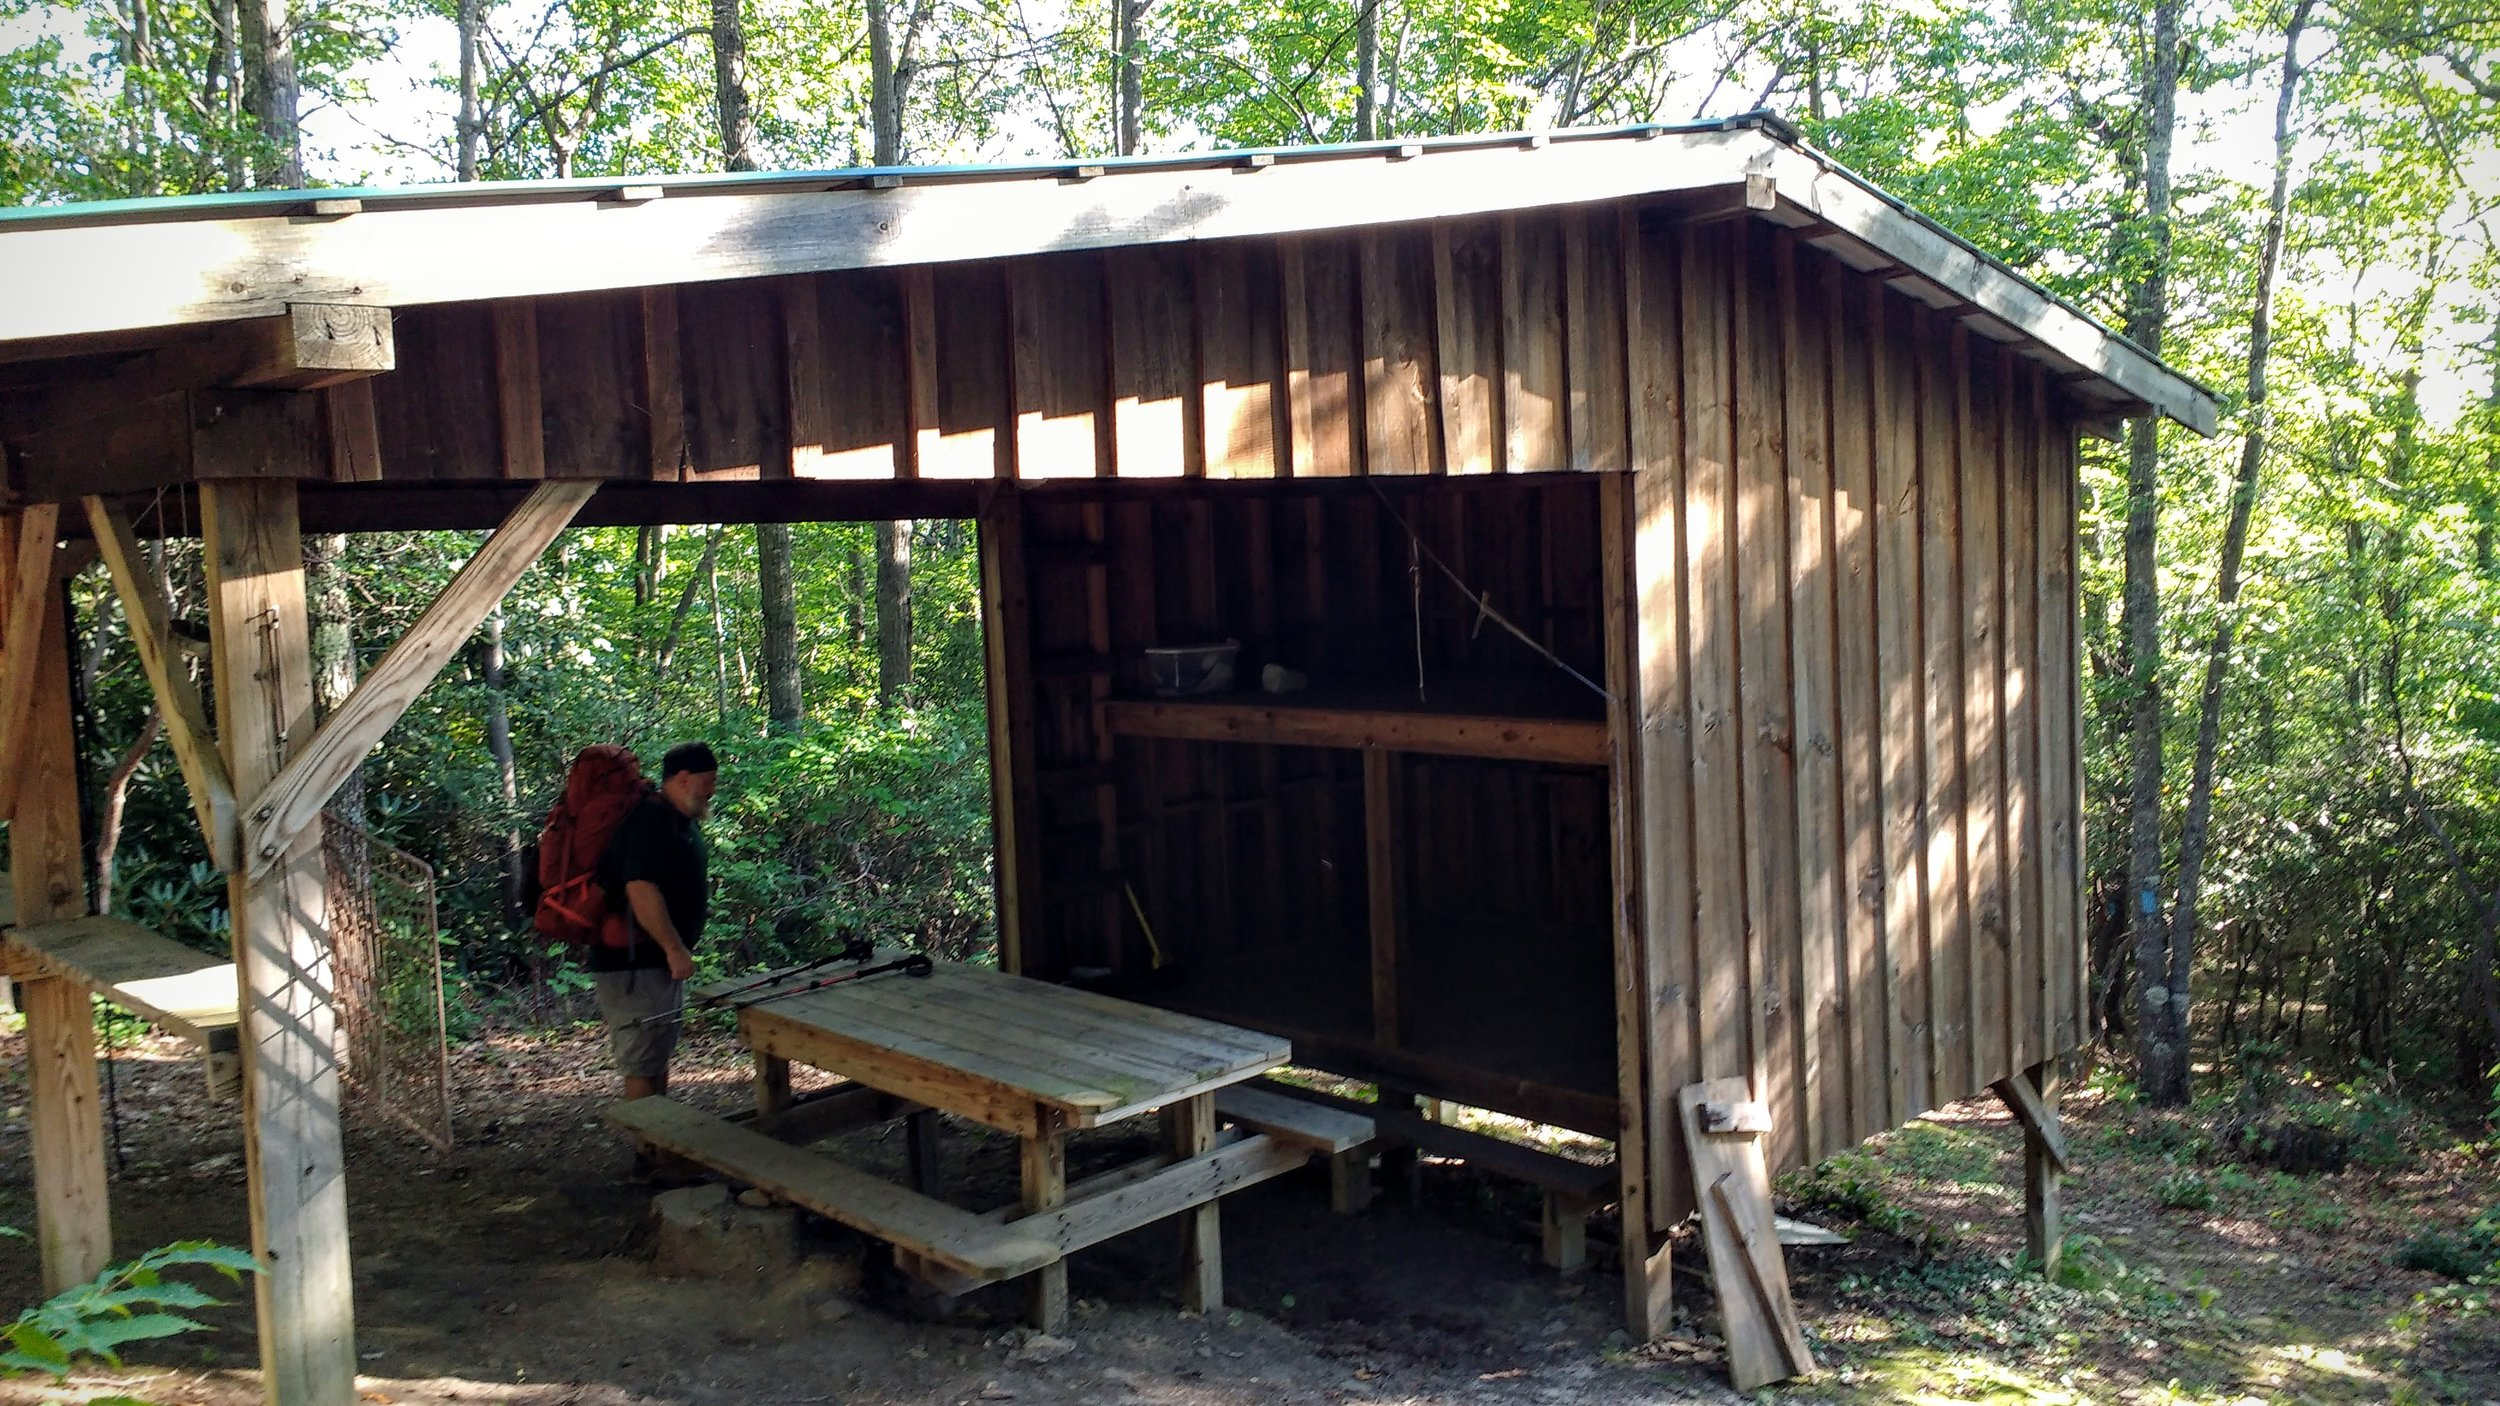 Adena Springs Shelter on Pine Mountain Trail